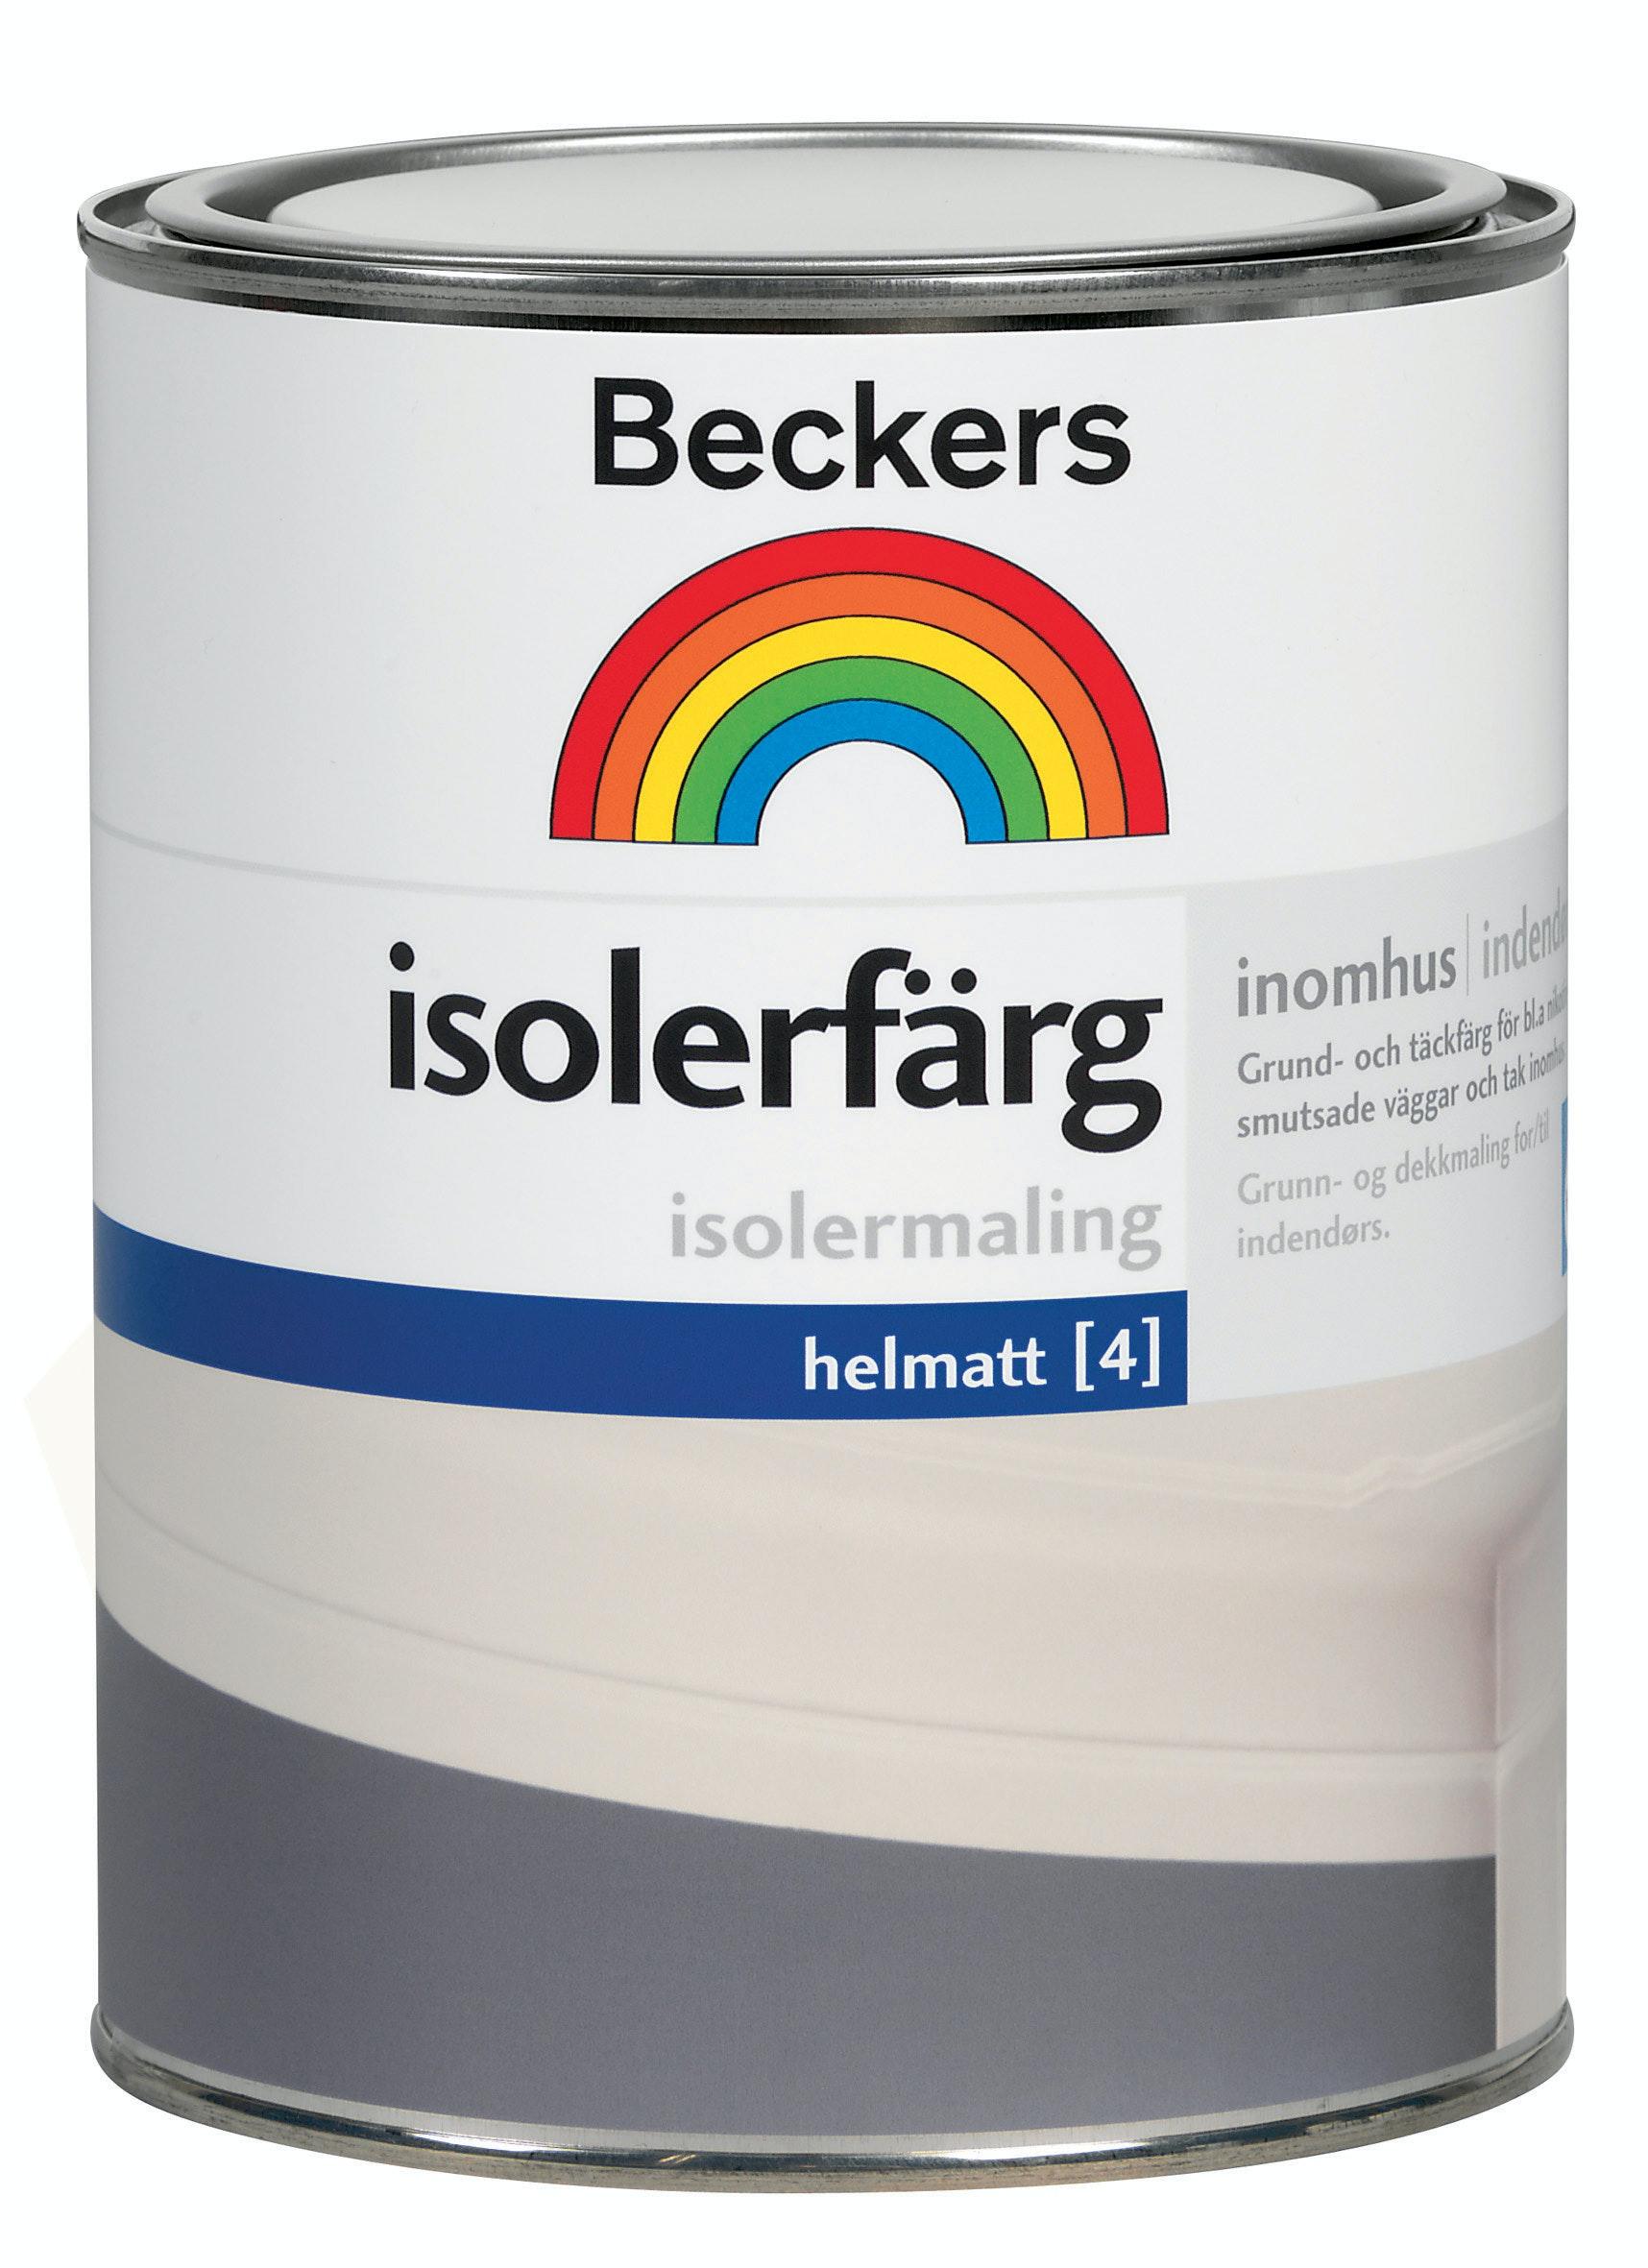 Isolerfärg Beckers Helmatt Vit 1l